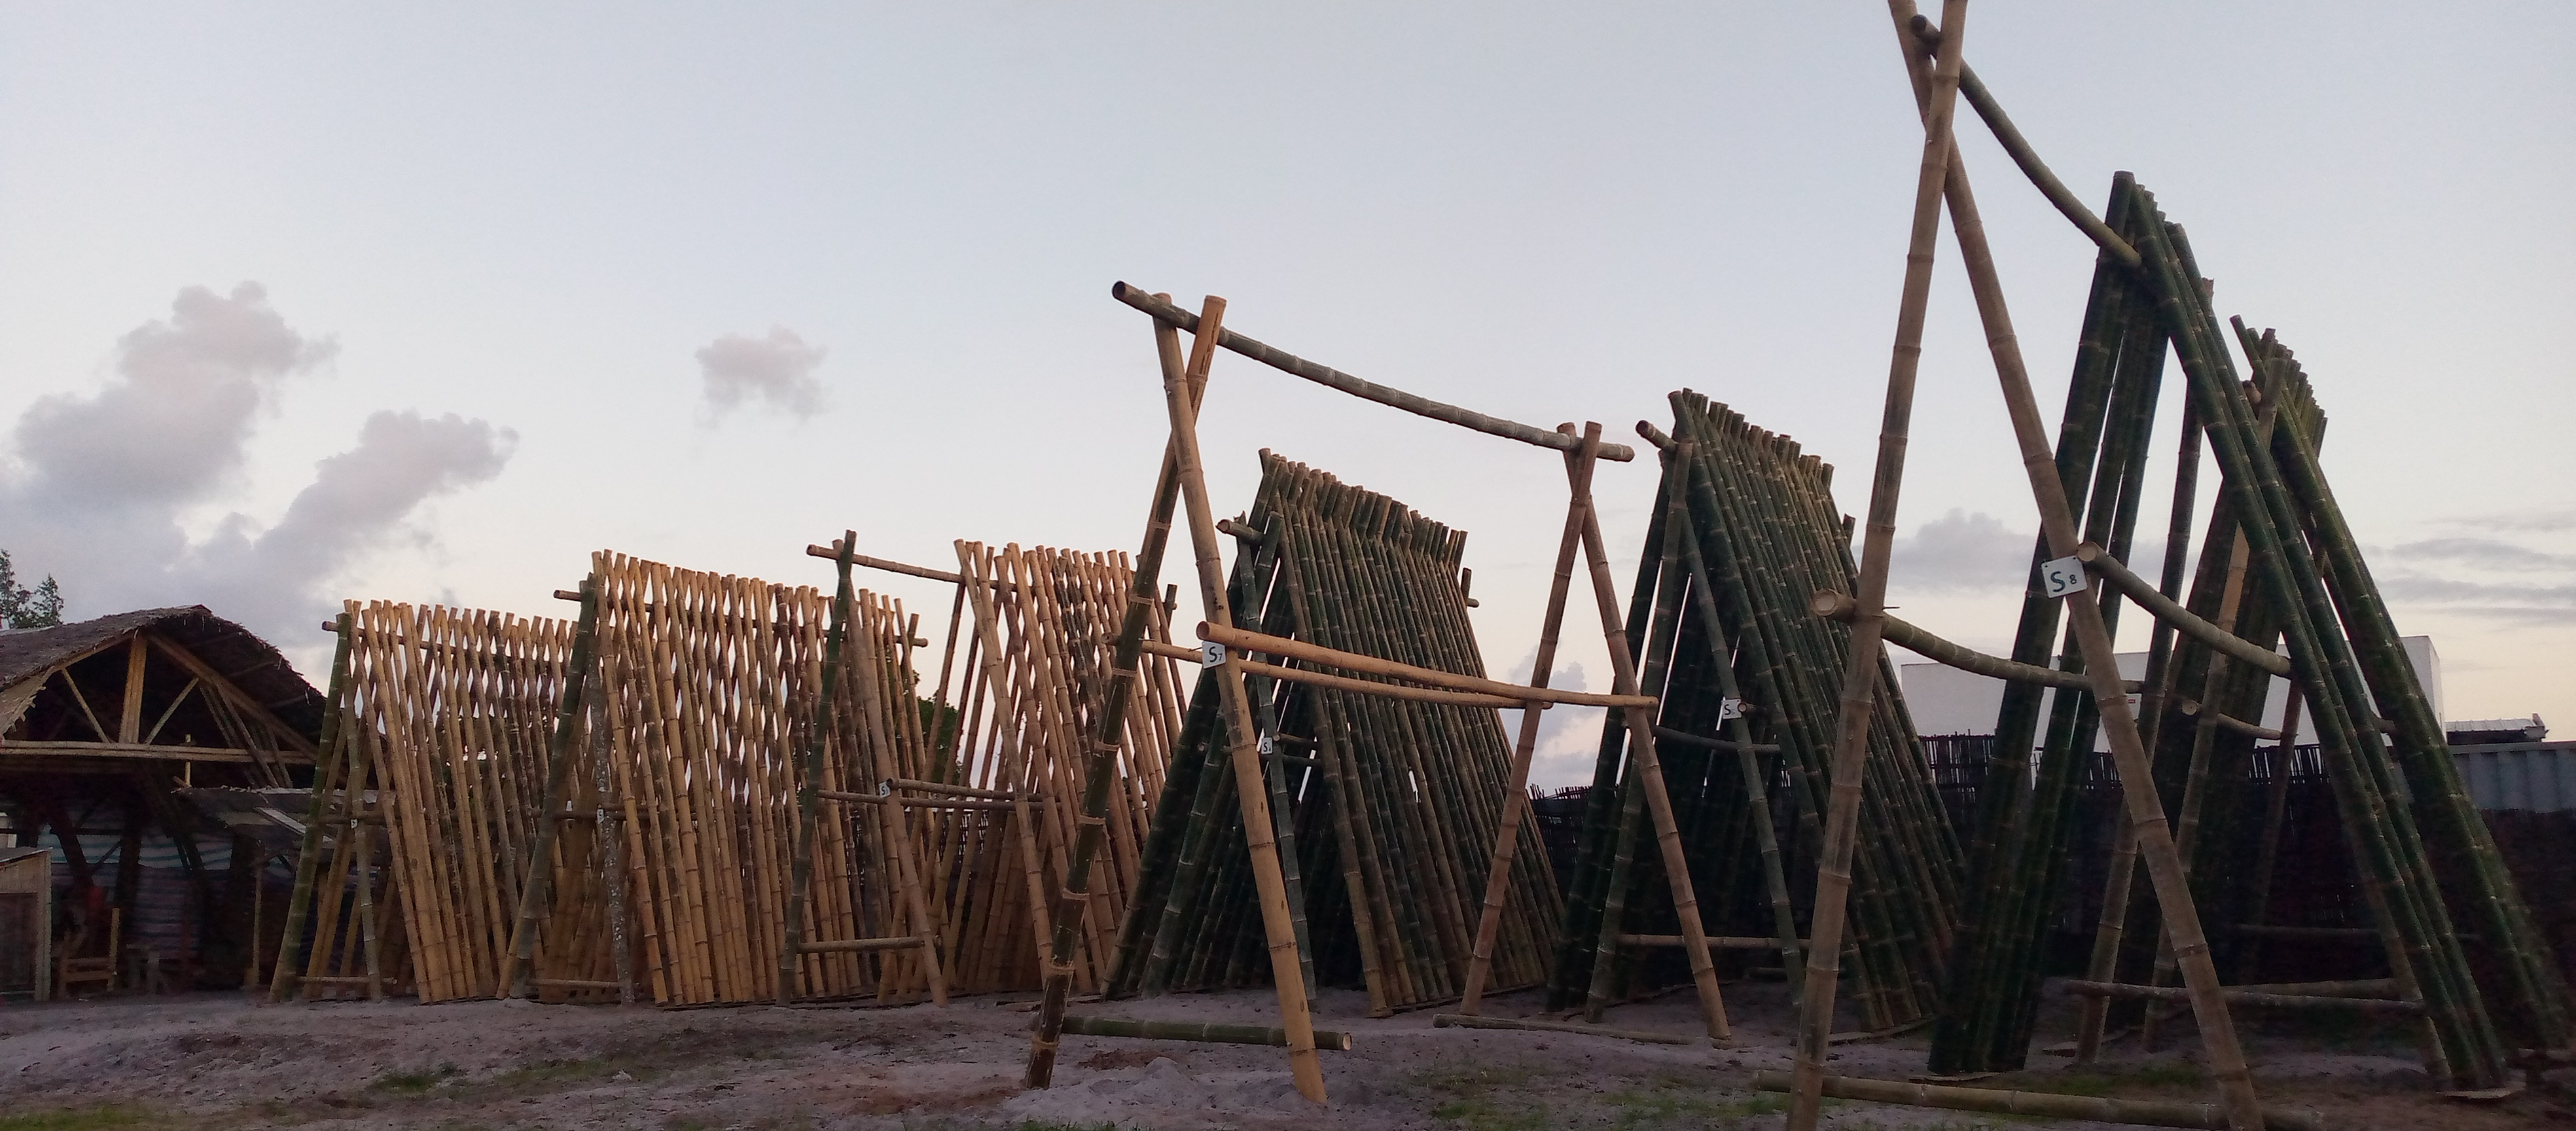 BambooTech